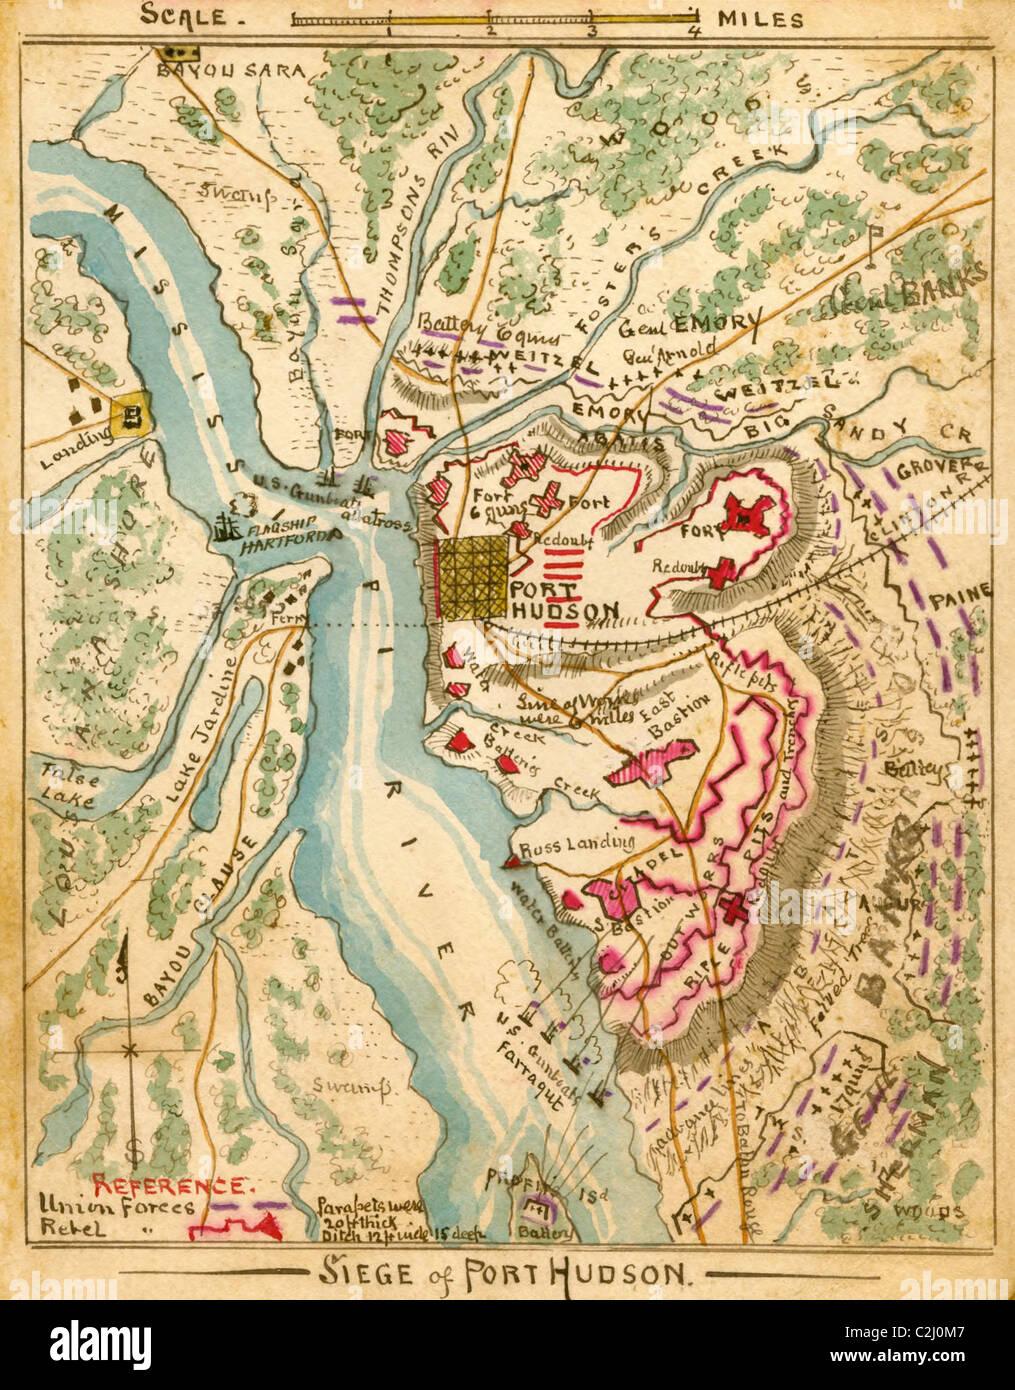 Siege of Port Hudson - Stock Image